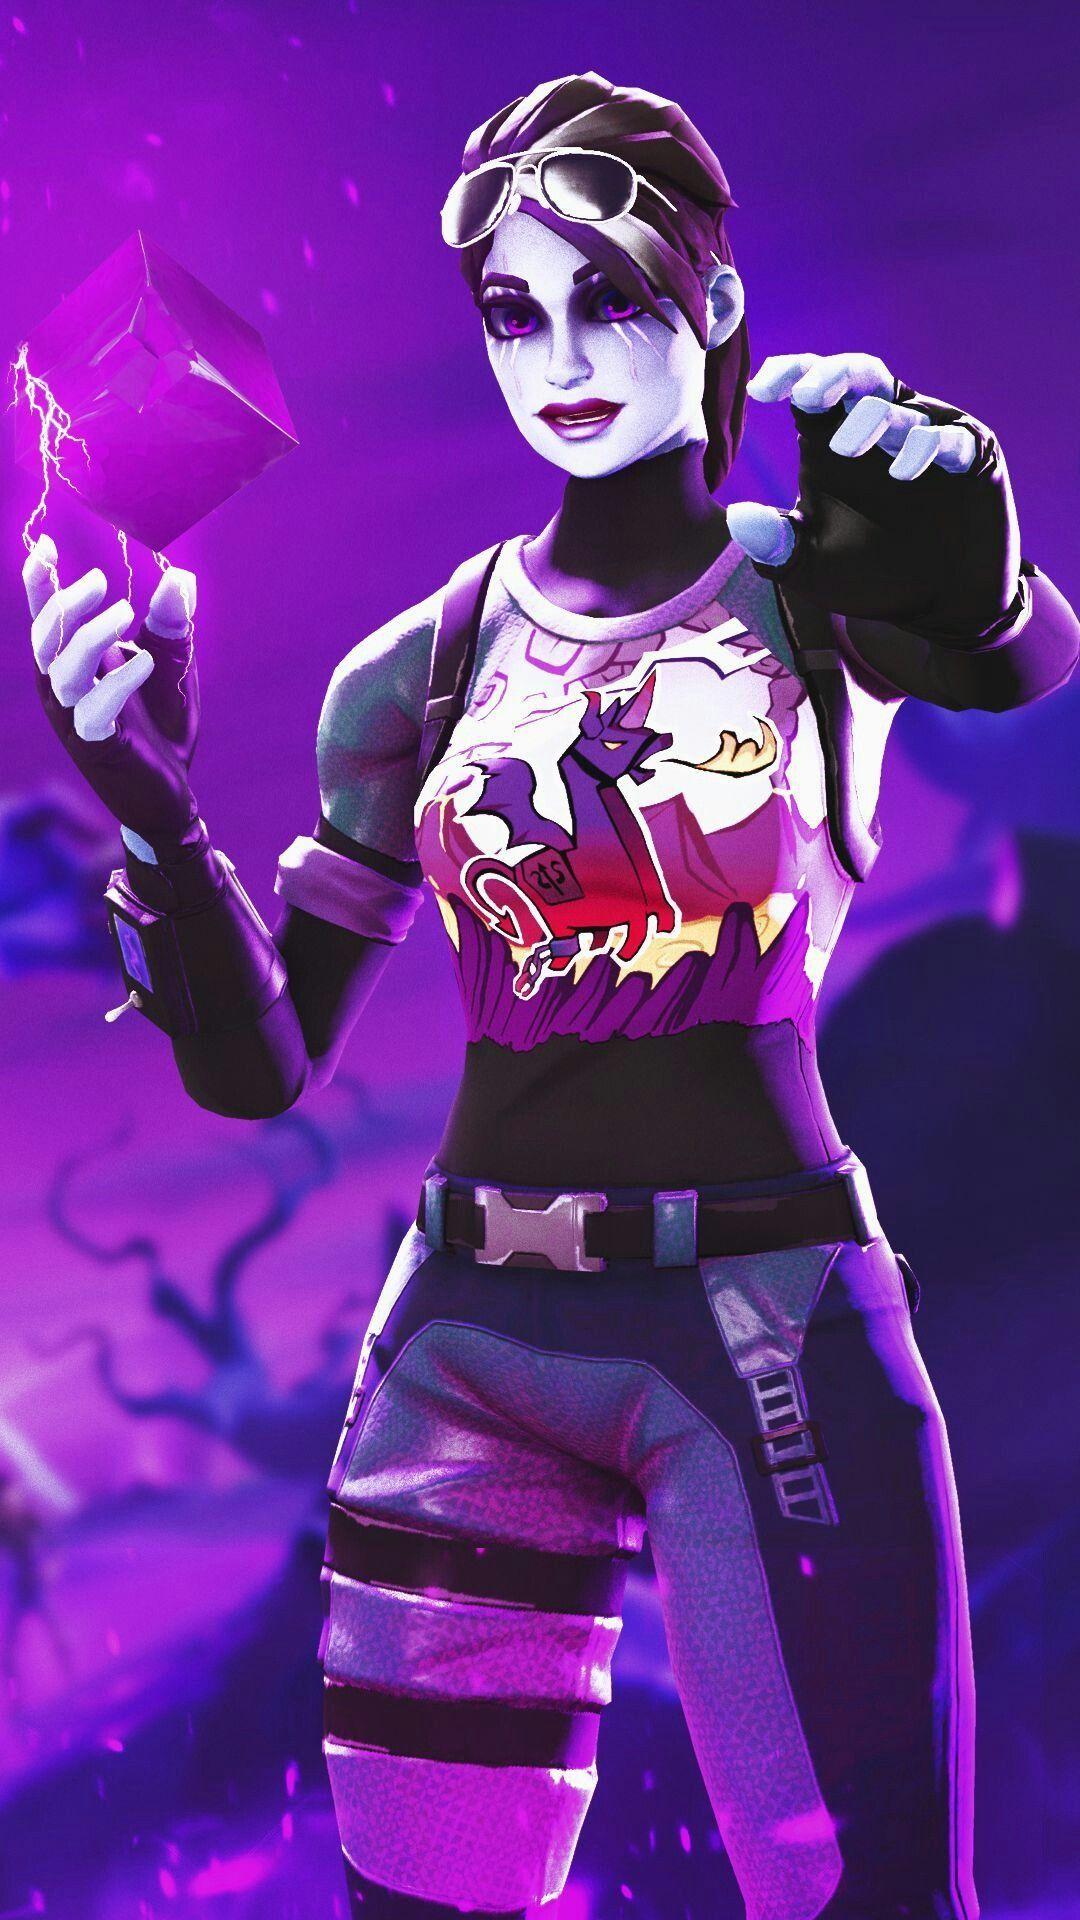 Dark Bomber Fortnite Skin Wallpaper Best gaming wallpapers 1080x1920